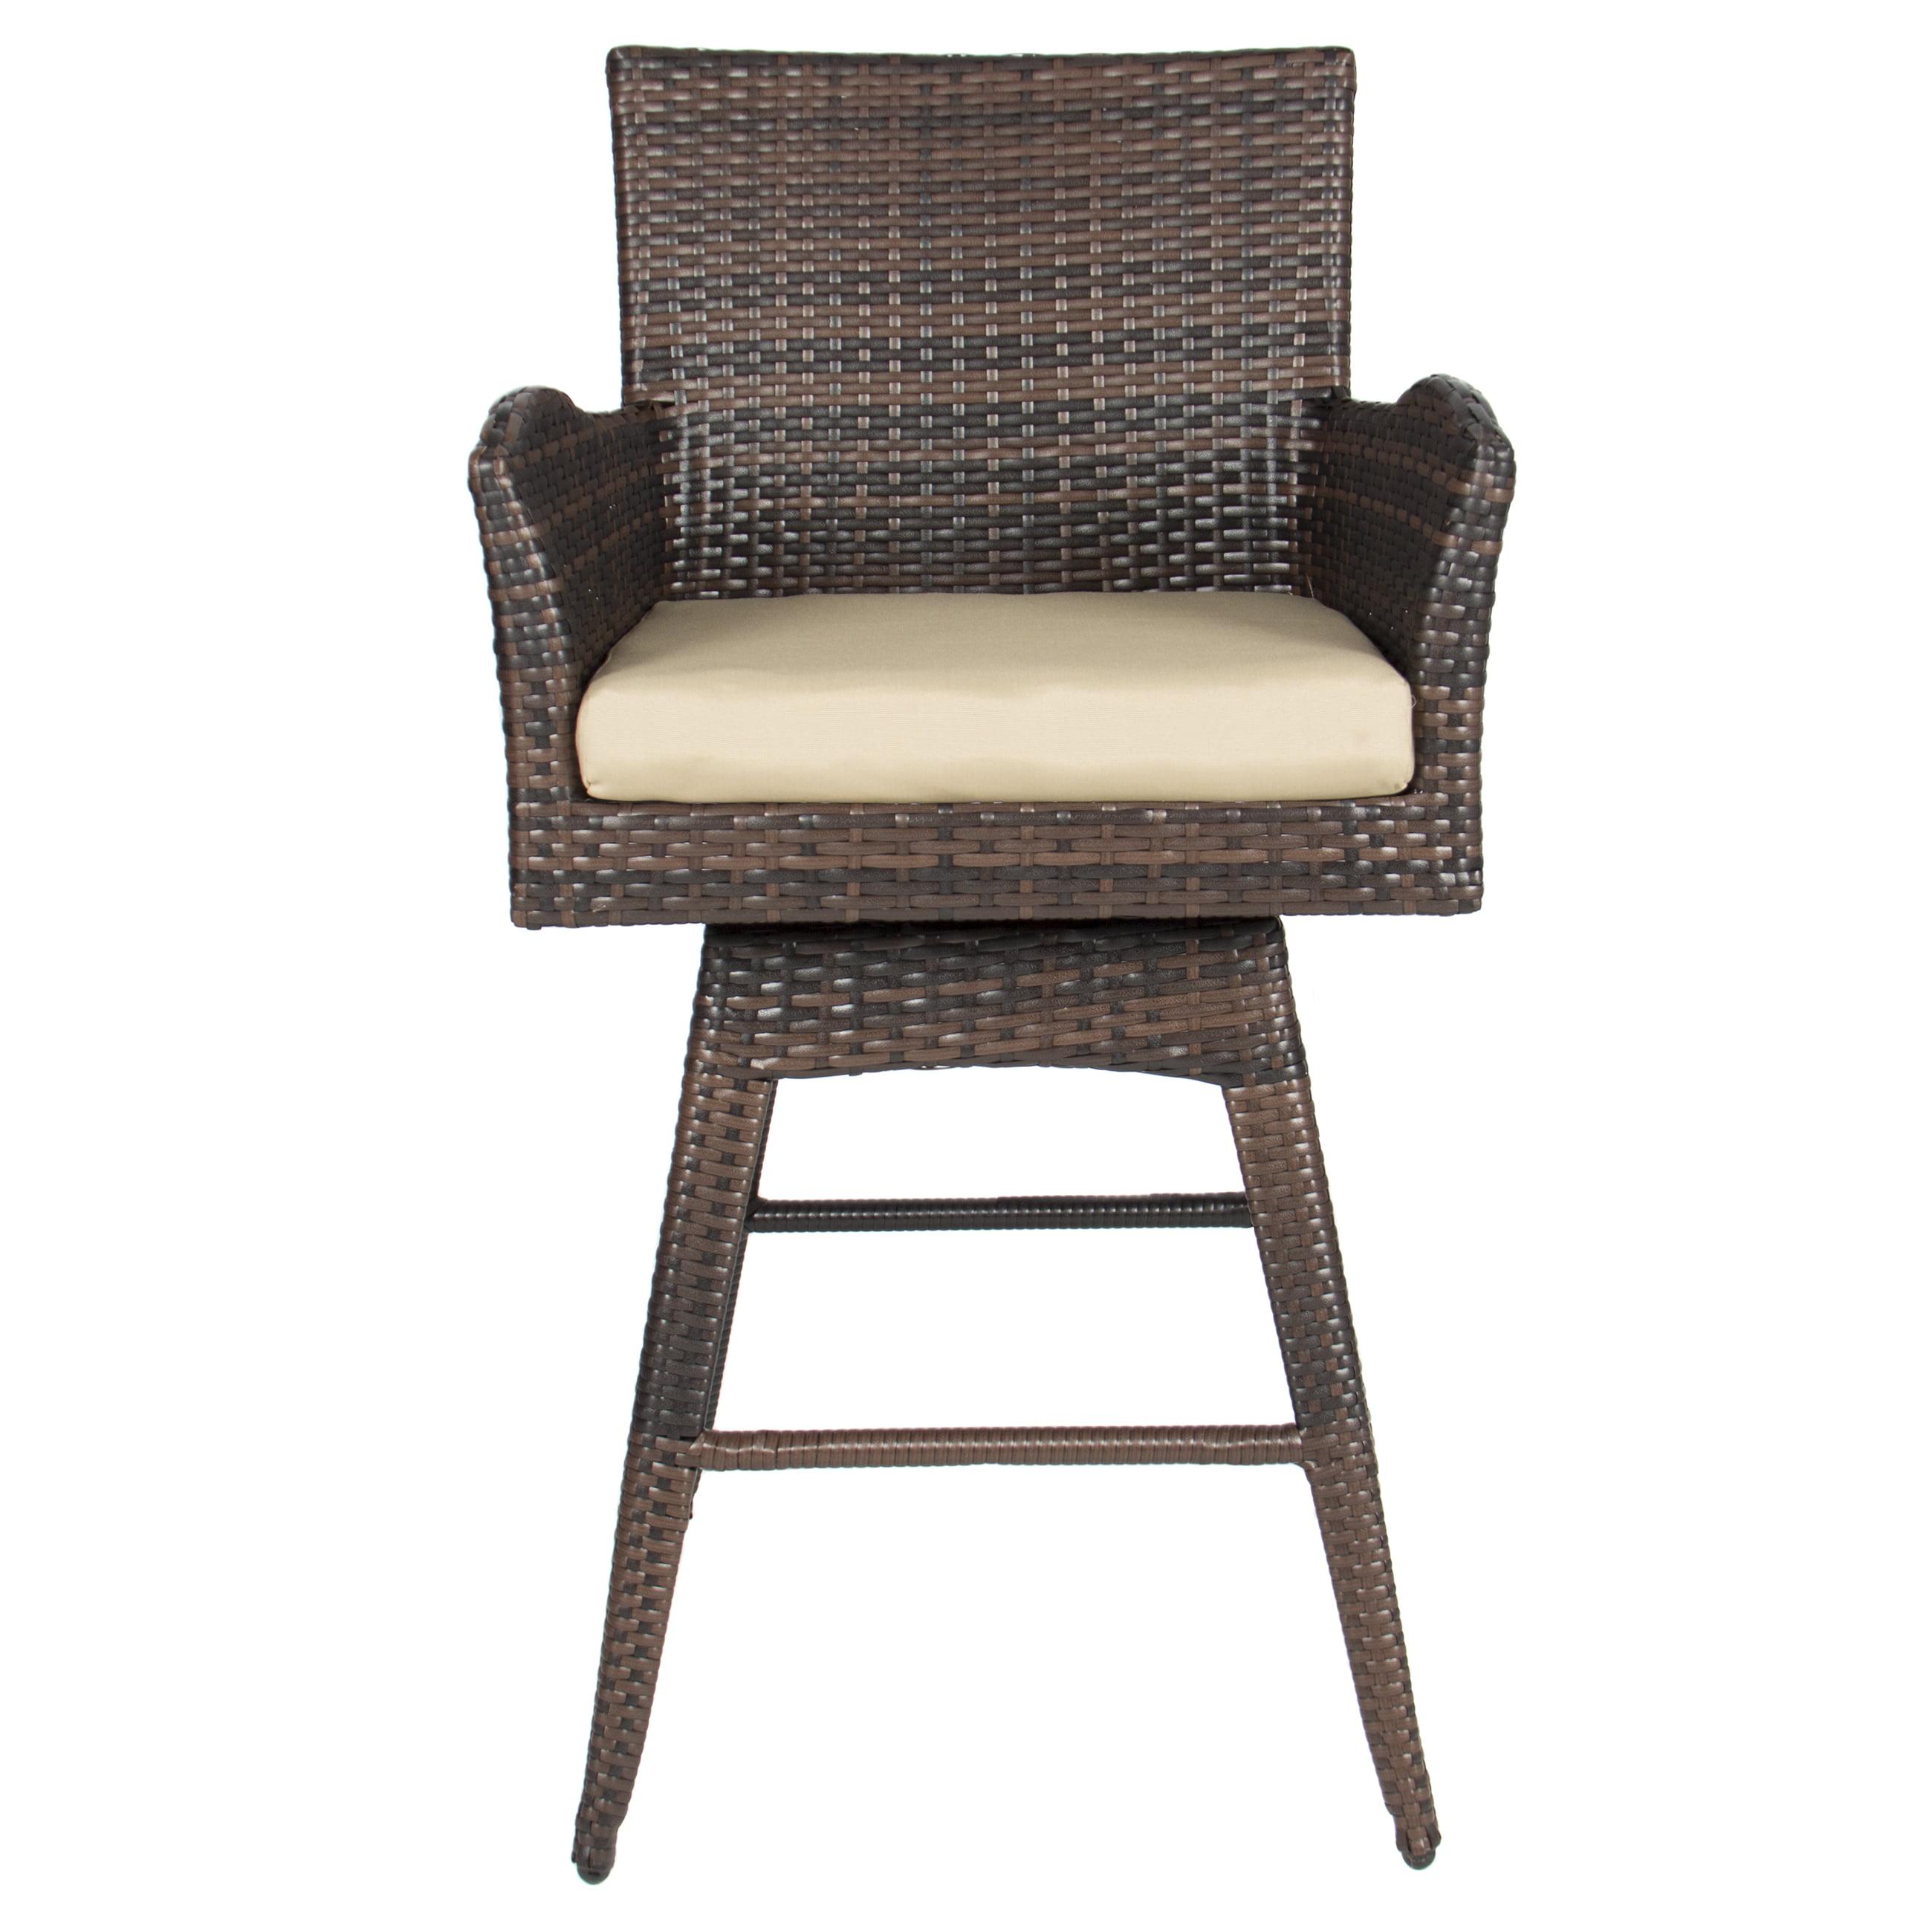 Outdoor Patio Furniture All Weather Brown PE Wicker Swivel Bar Stool W/  Cushion   Walmart.com